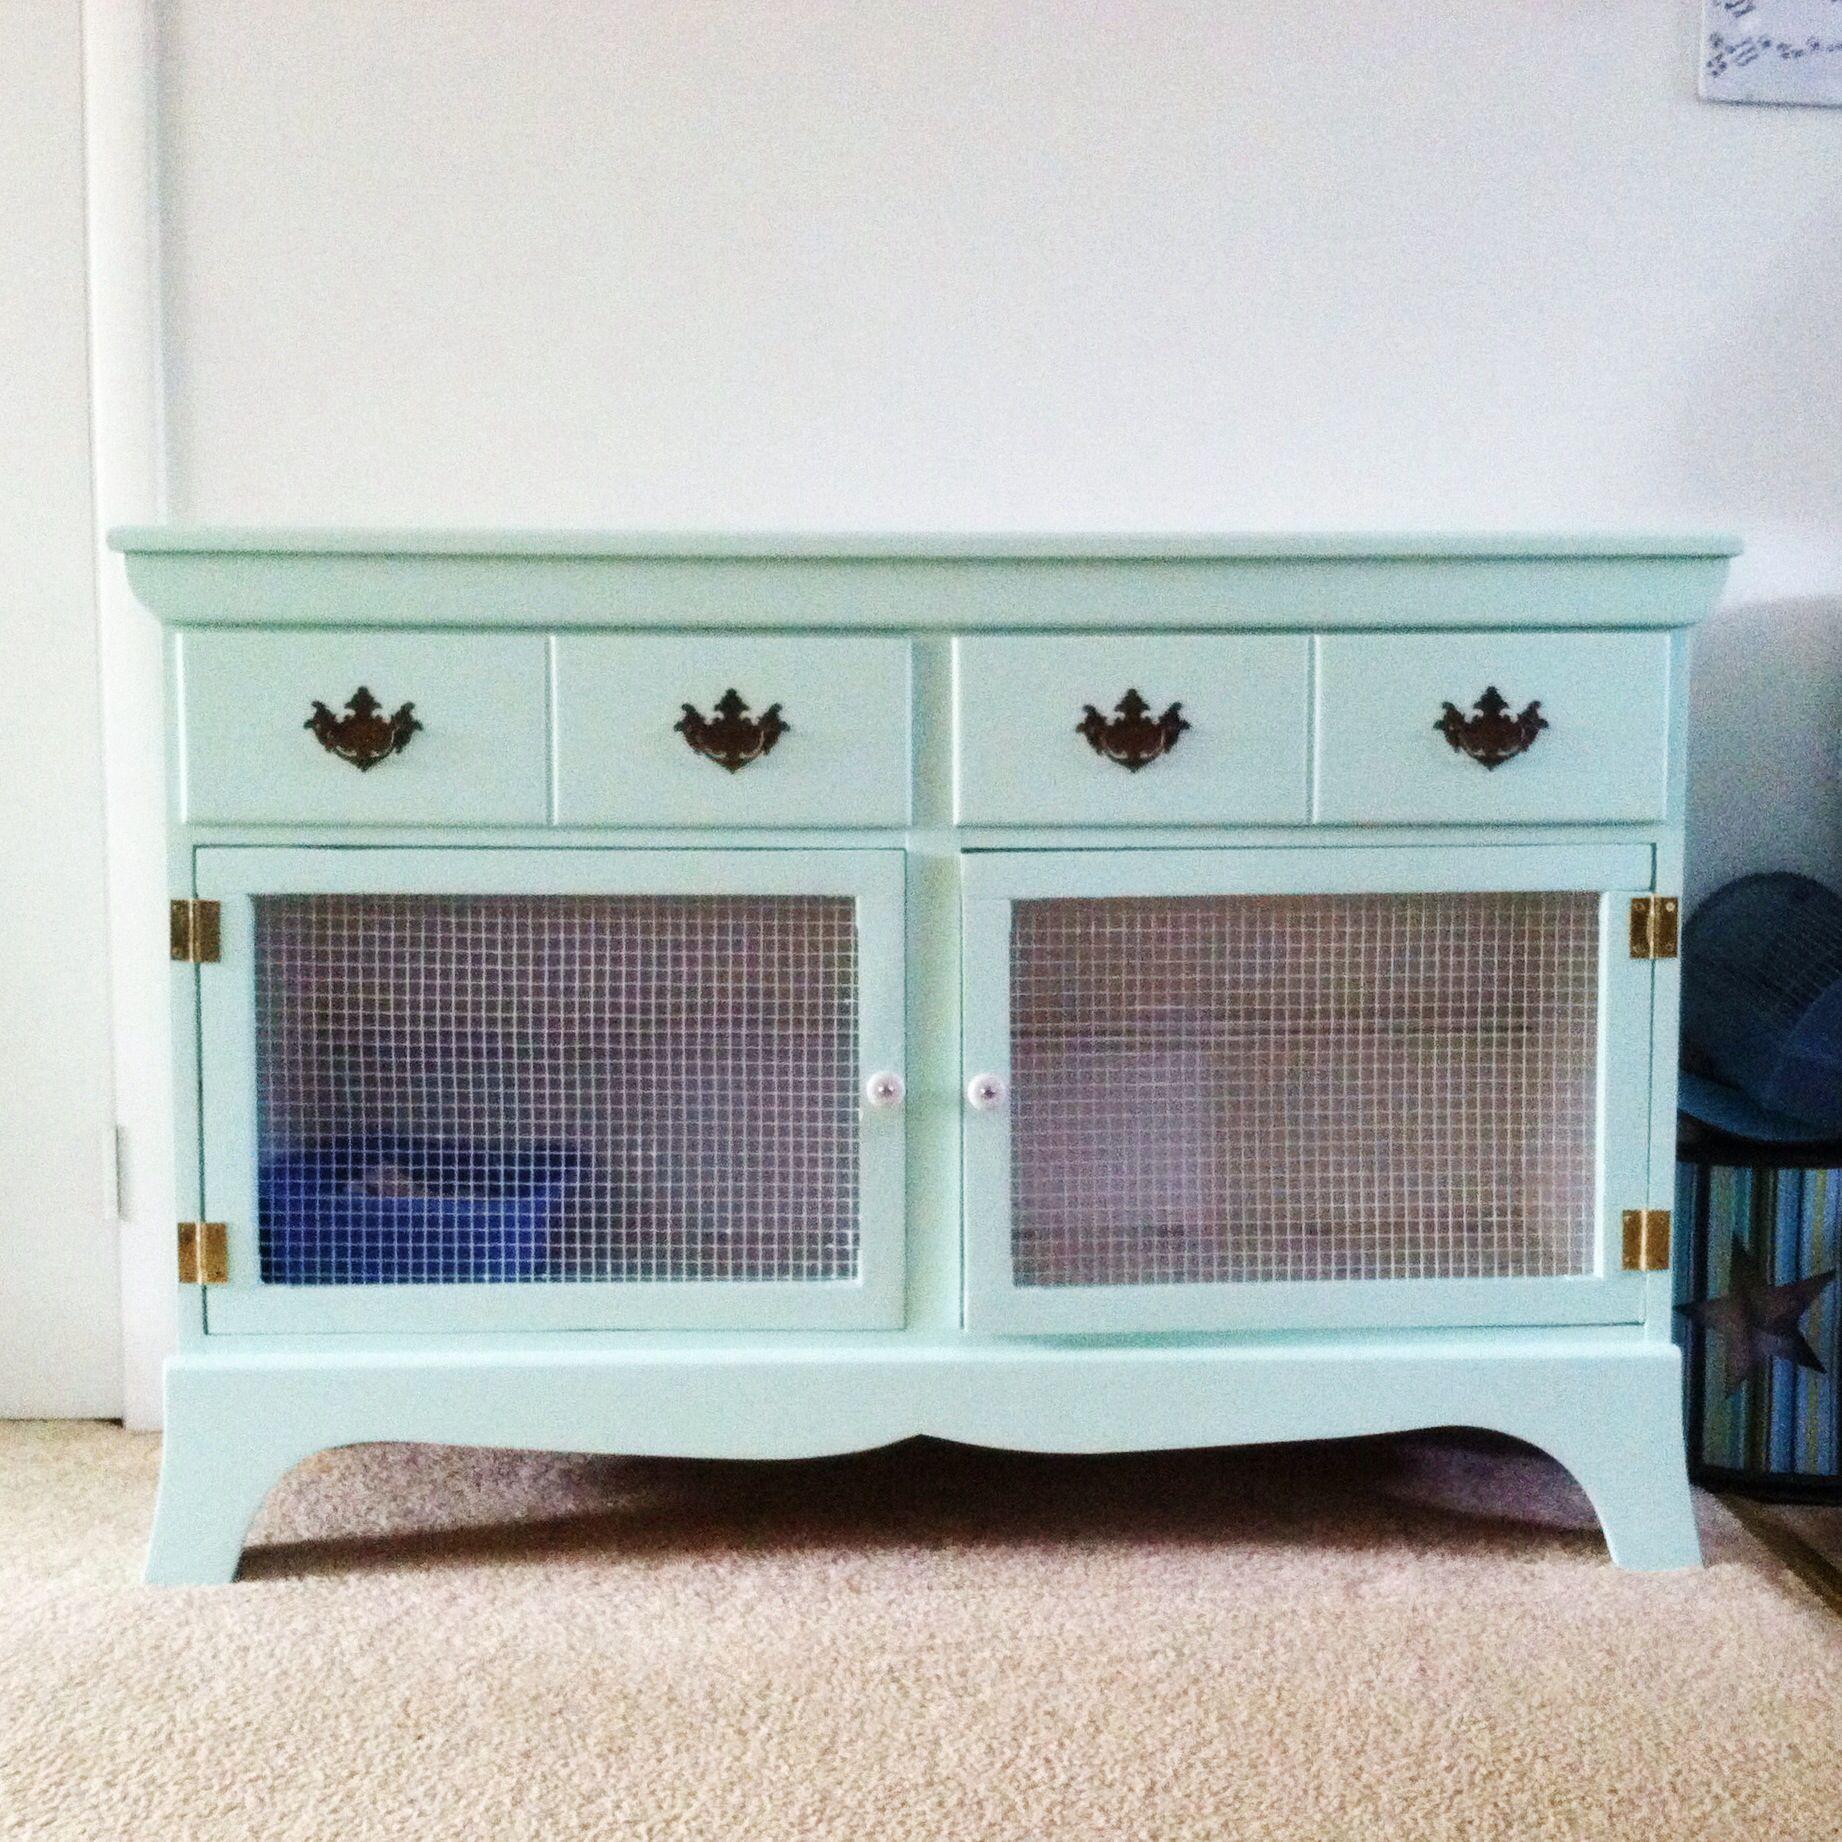 diy rabbit hutch repurposed from a dresser poule lapin nain cochon d